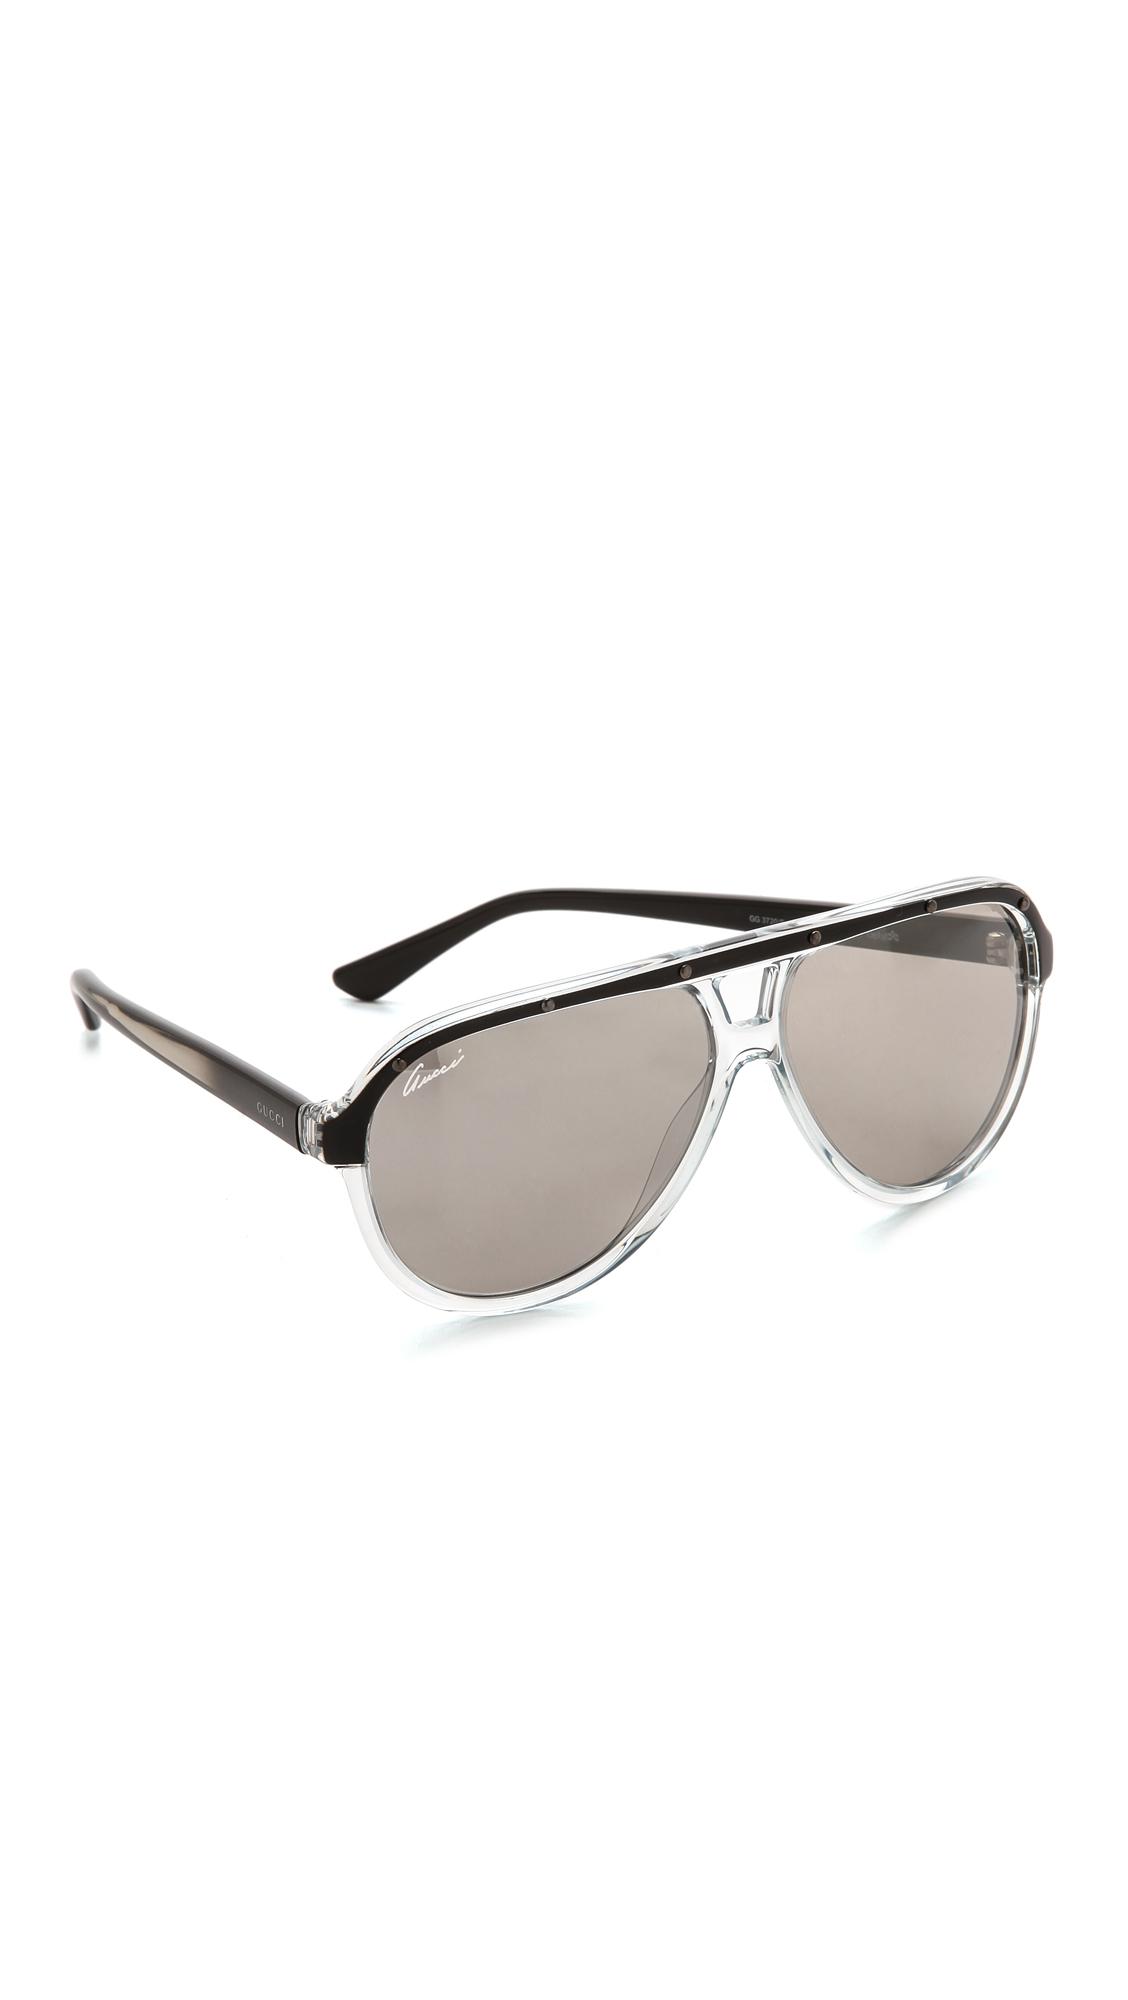 b0a28f0eb35 Gucci Aviator Sunglasses - Violet Black pink in Black - Lyst